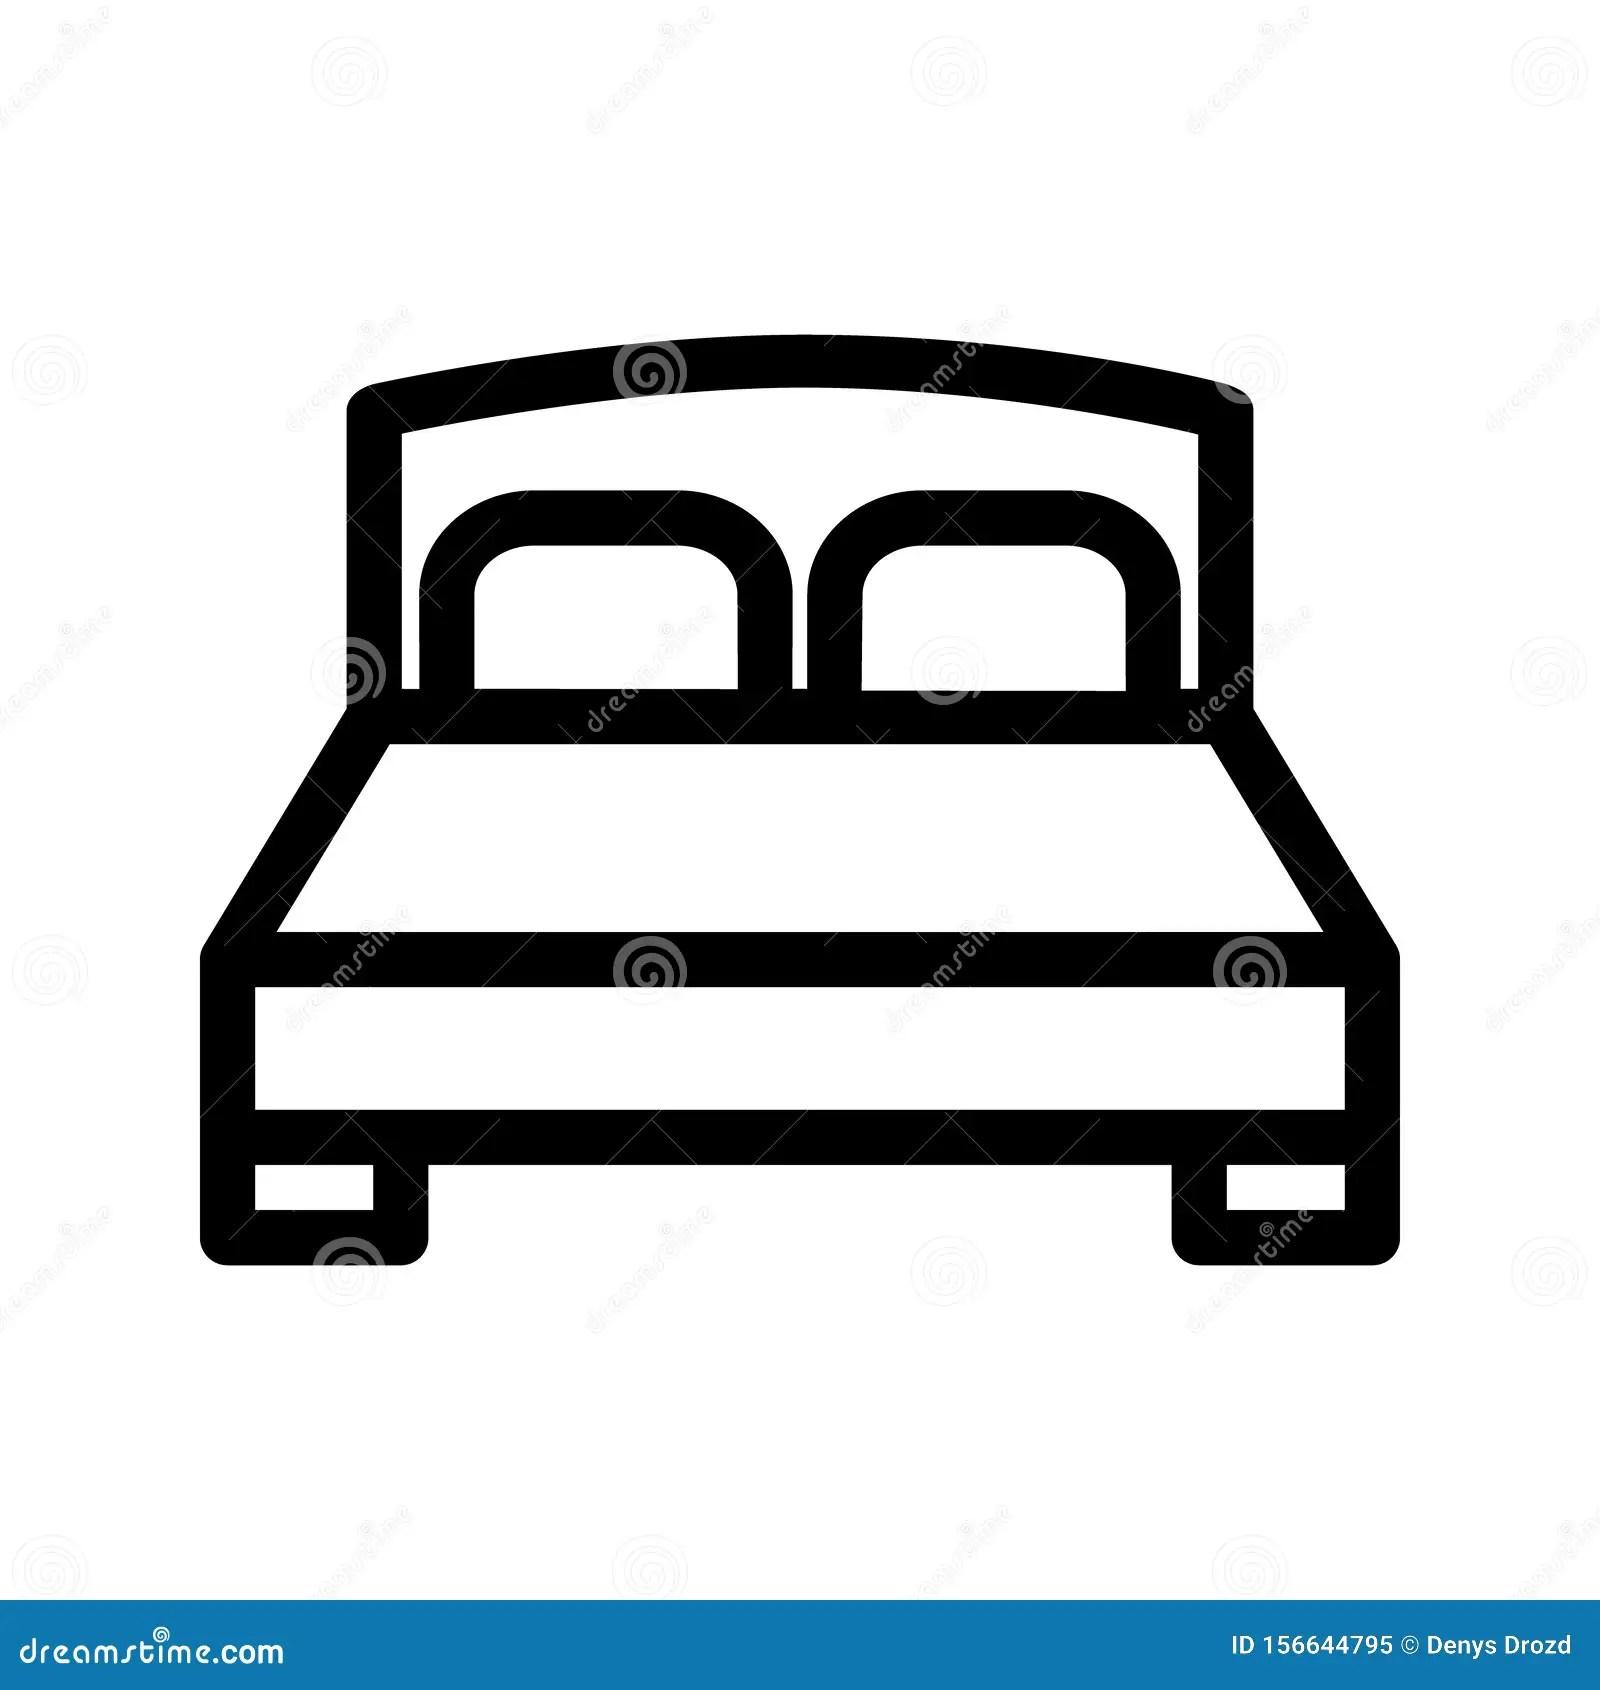 Bed Icon Vector Bedroom Illustration Symbol Hotel Logo Or Sign Stock Vector Illustration Of Motel Bedroom 156644795